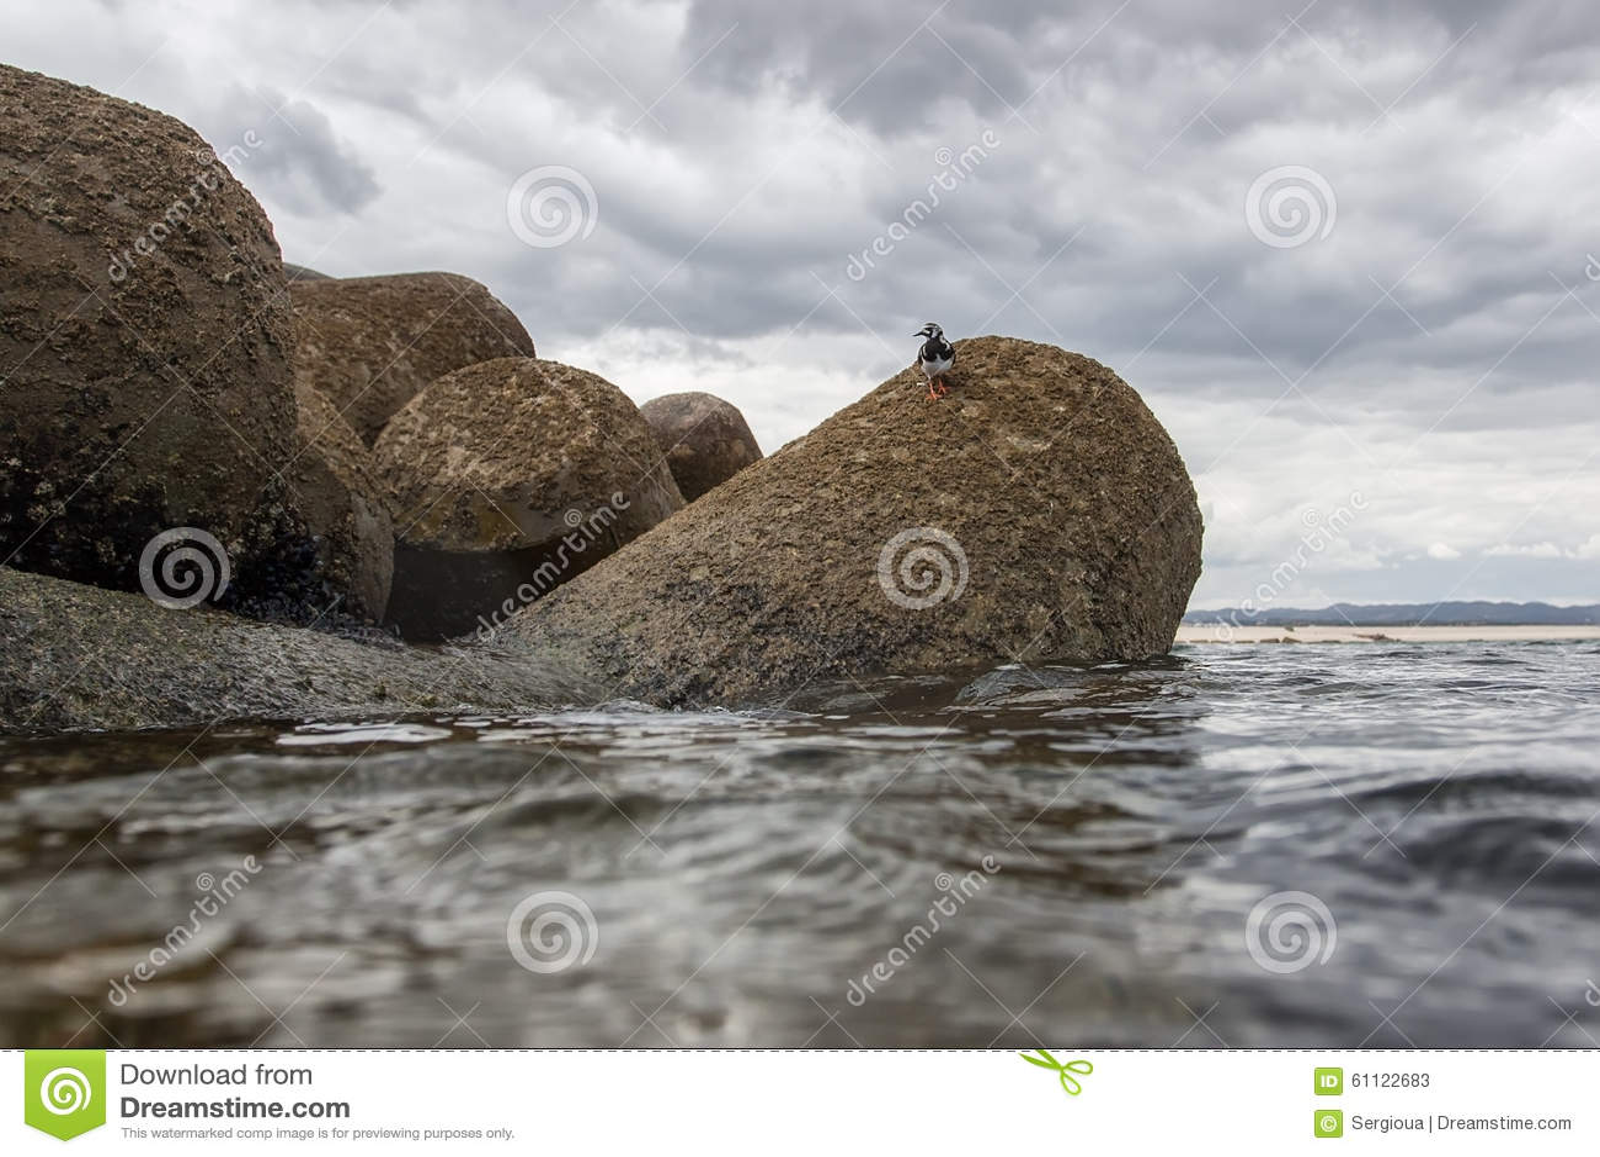 Hypoleucos do Actitis que andam nas pedras do Oceano Atlântico